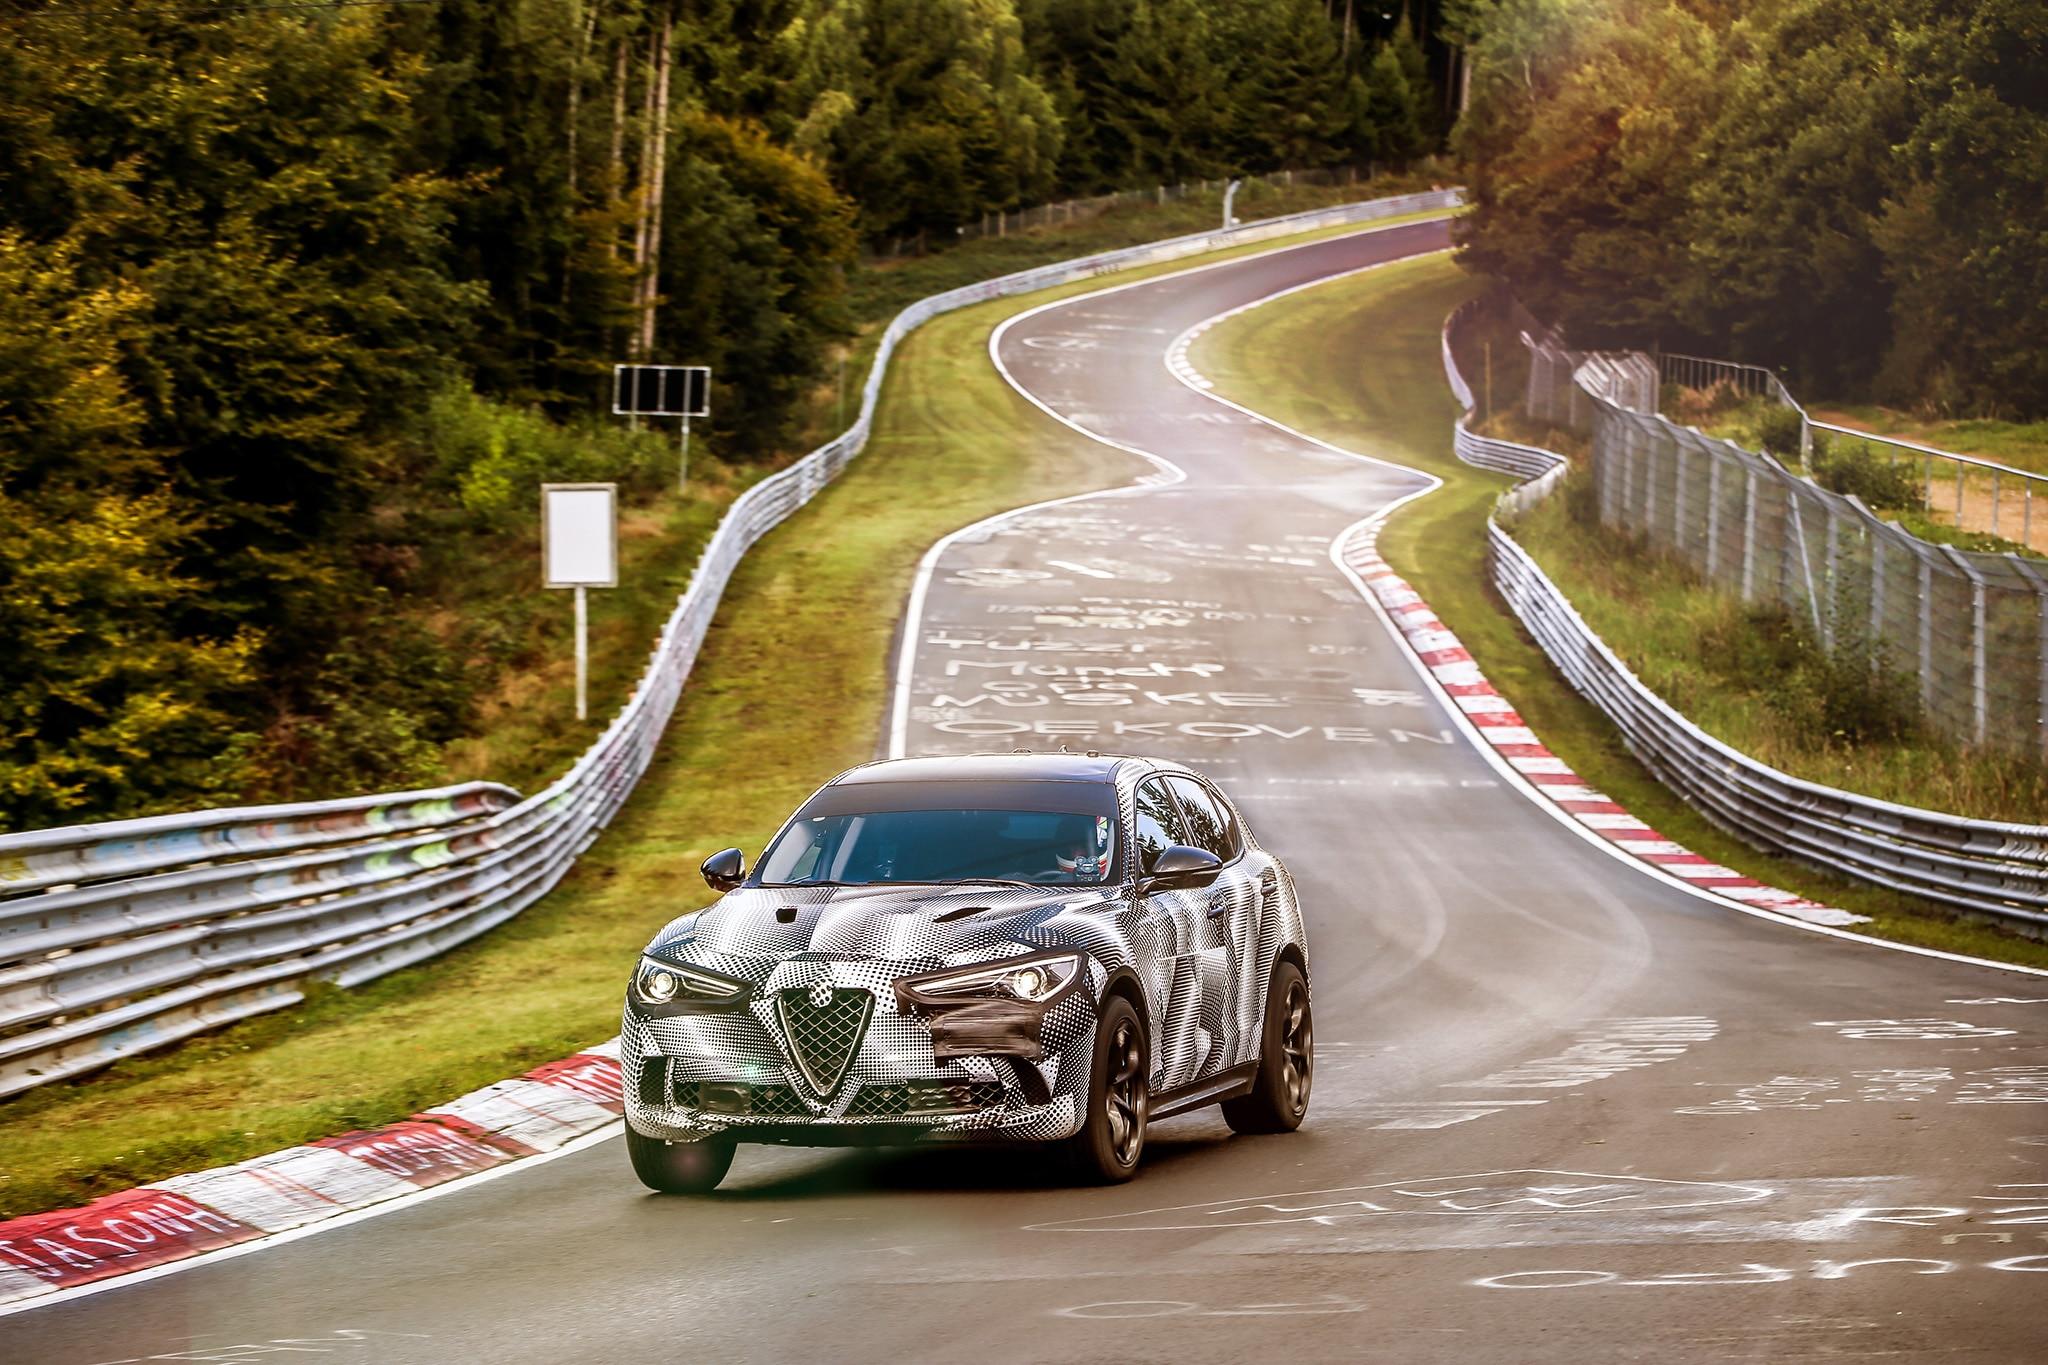 Stelvio Quadrifoglio Sets Nurburgring Lap Time Record